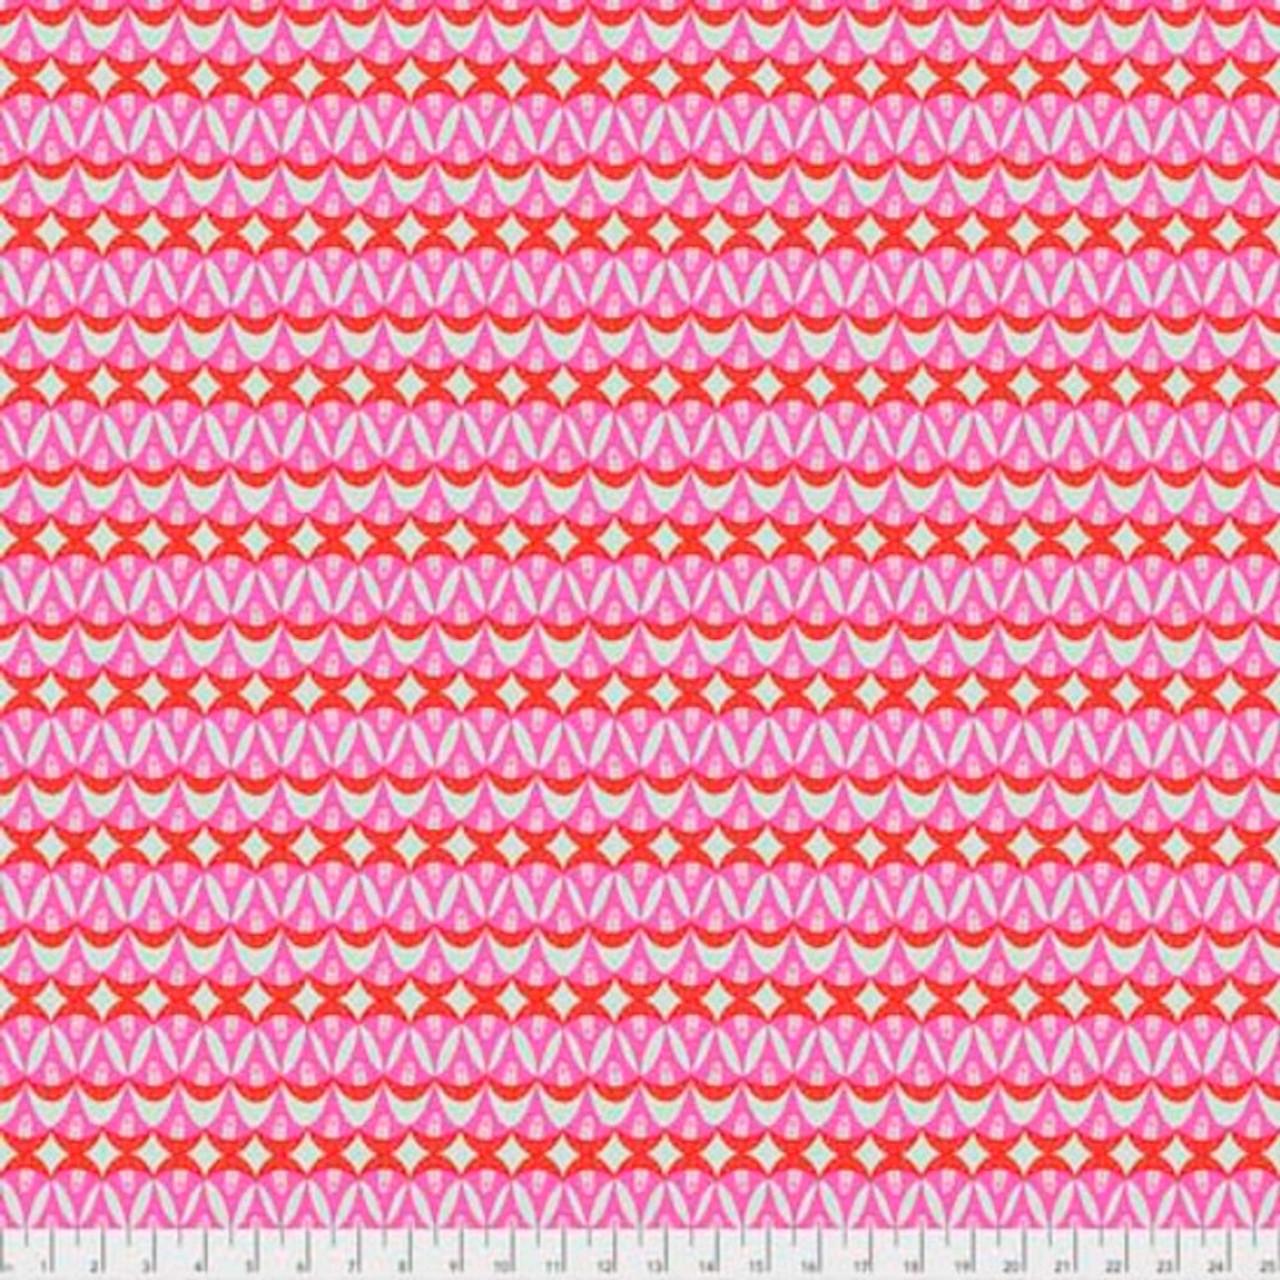 Shannon Newlin Garden Dreams PWSN0015 Watermelon Pink Cotton Fabric By Yd